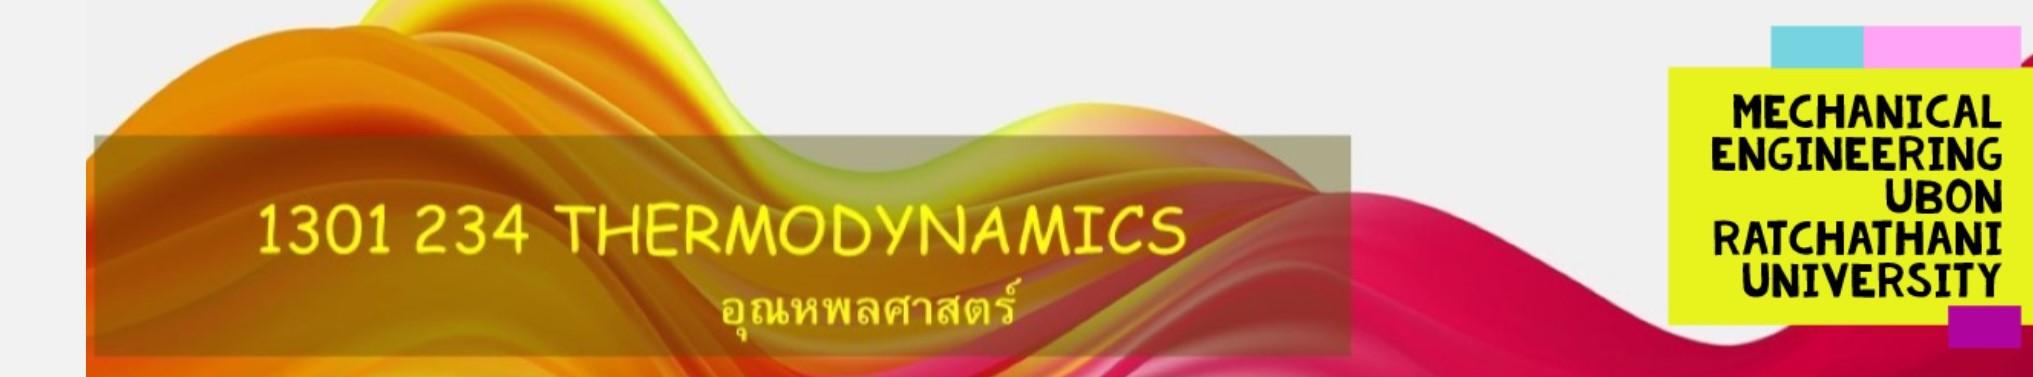 1301234 Thermodynamics